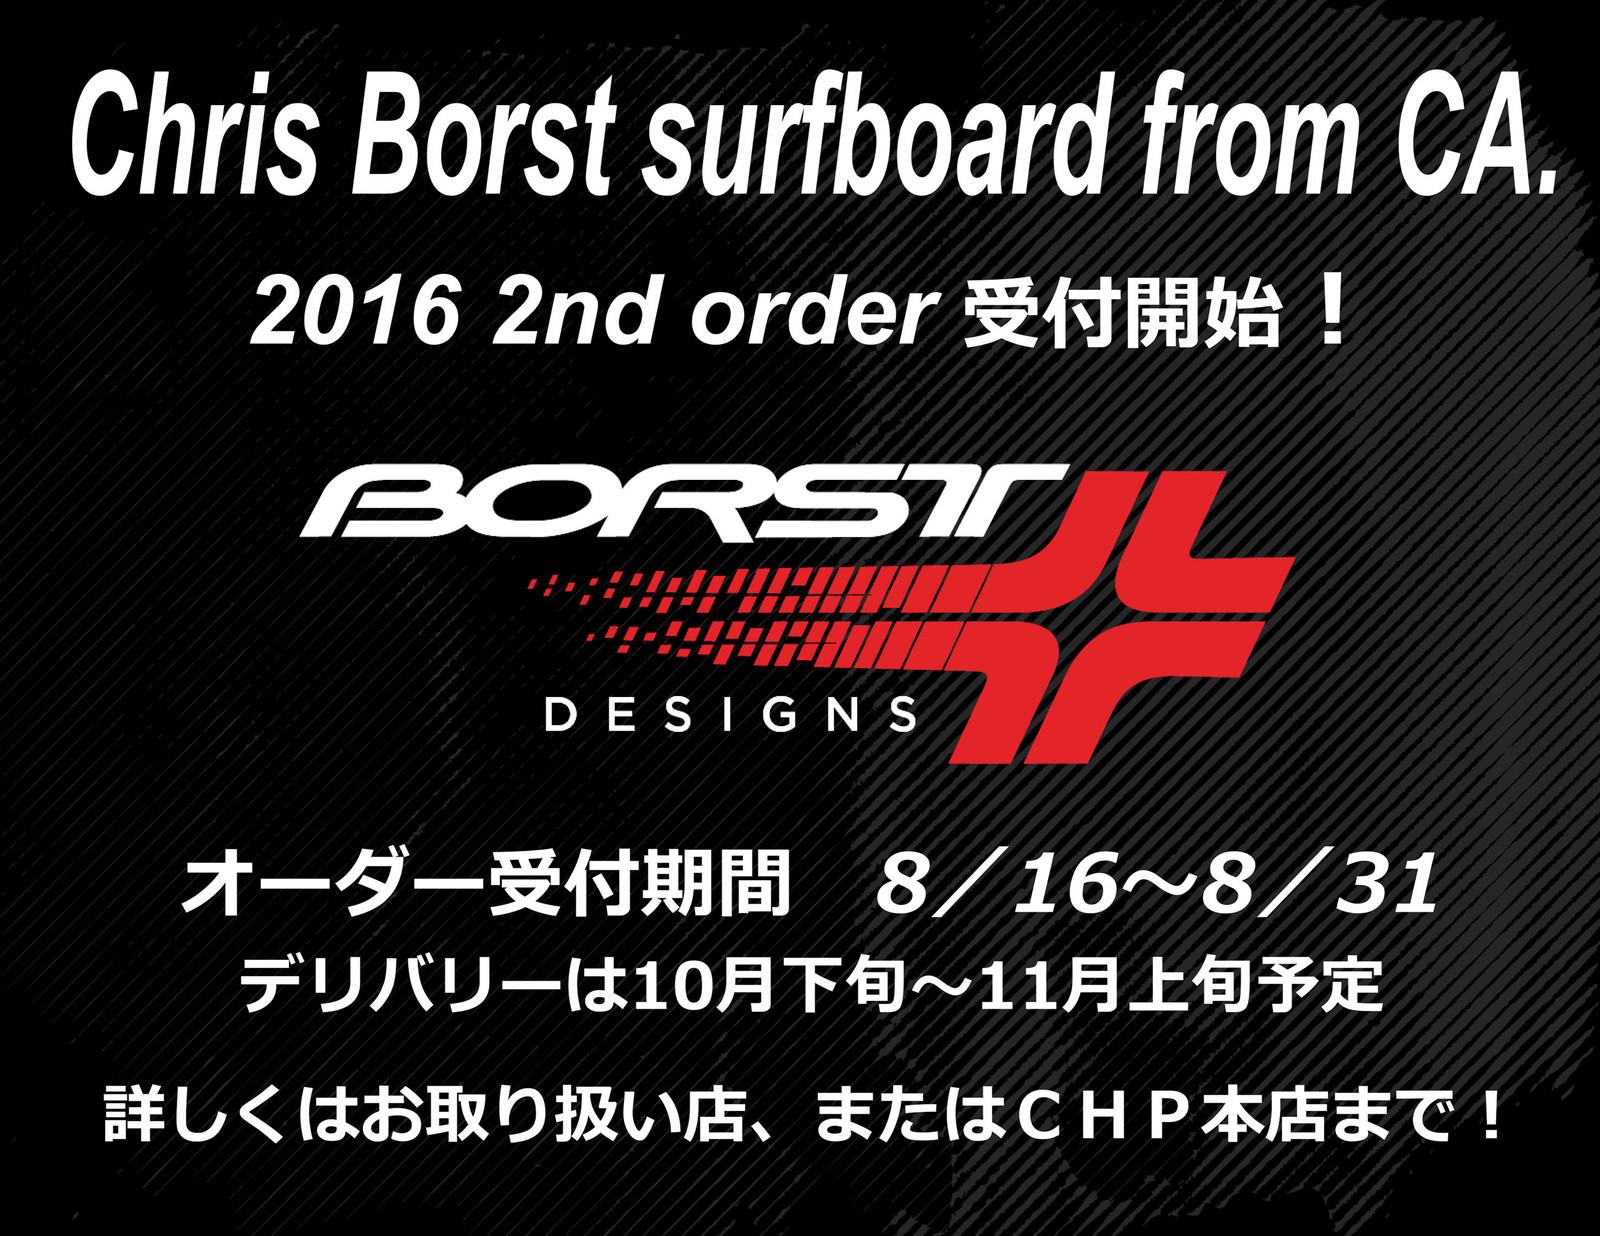 Borst_2016_2nd_order_pop